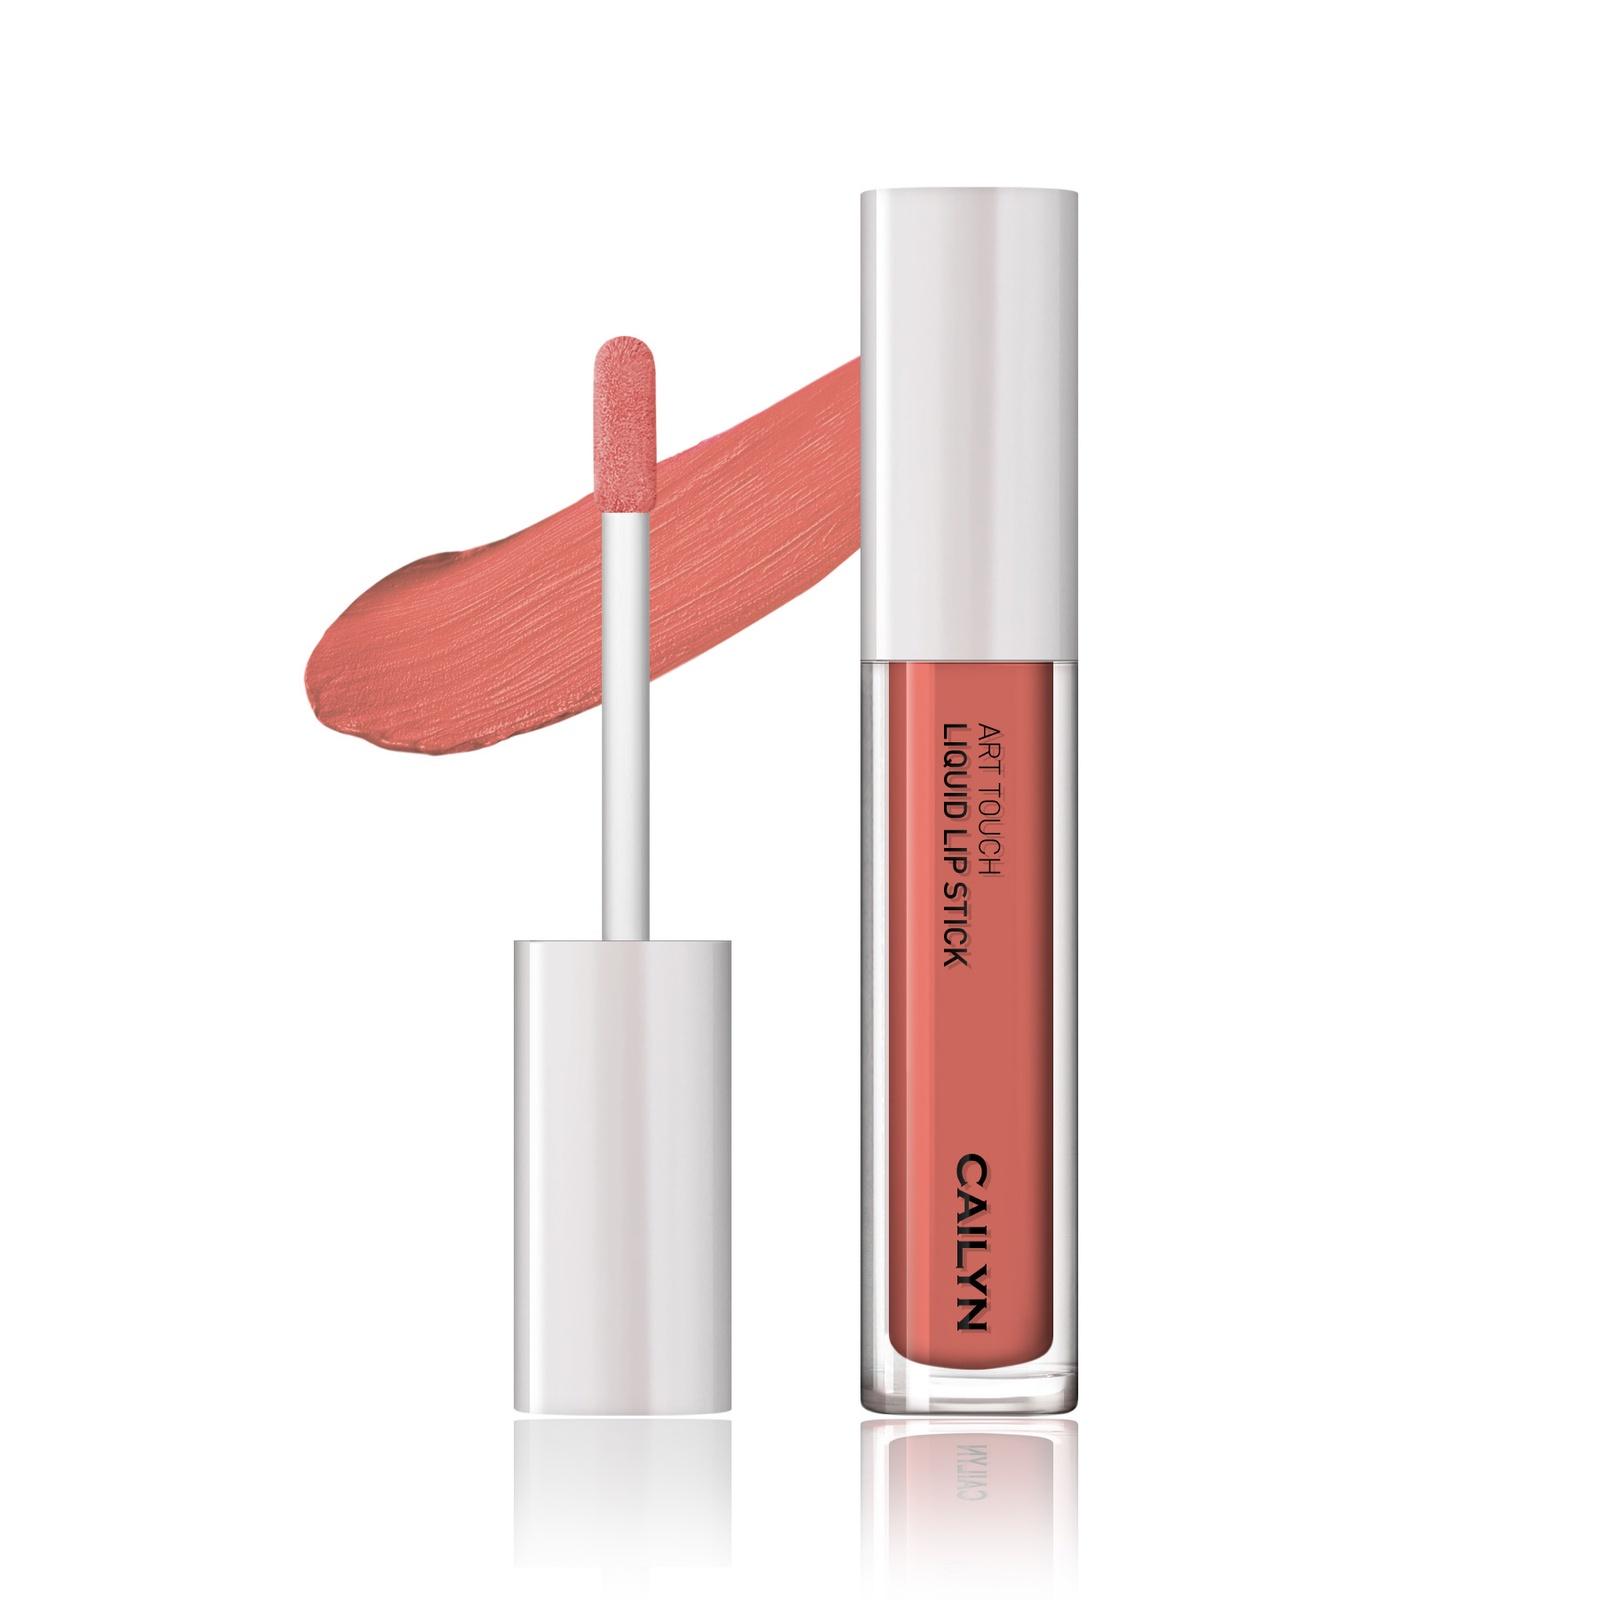 Губная помада CAILYN Art Touch Liquid Lipstick кремовая, 03 Hera, 4 мл